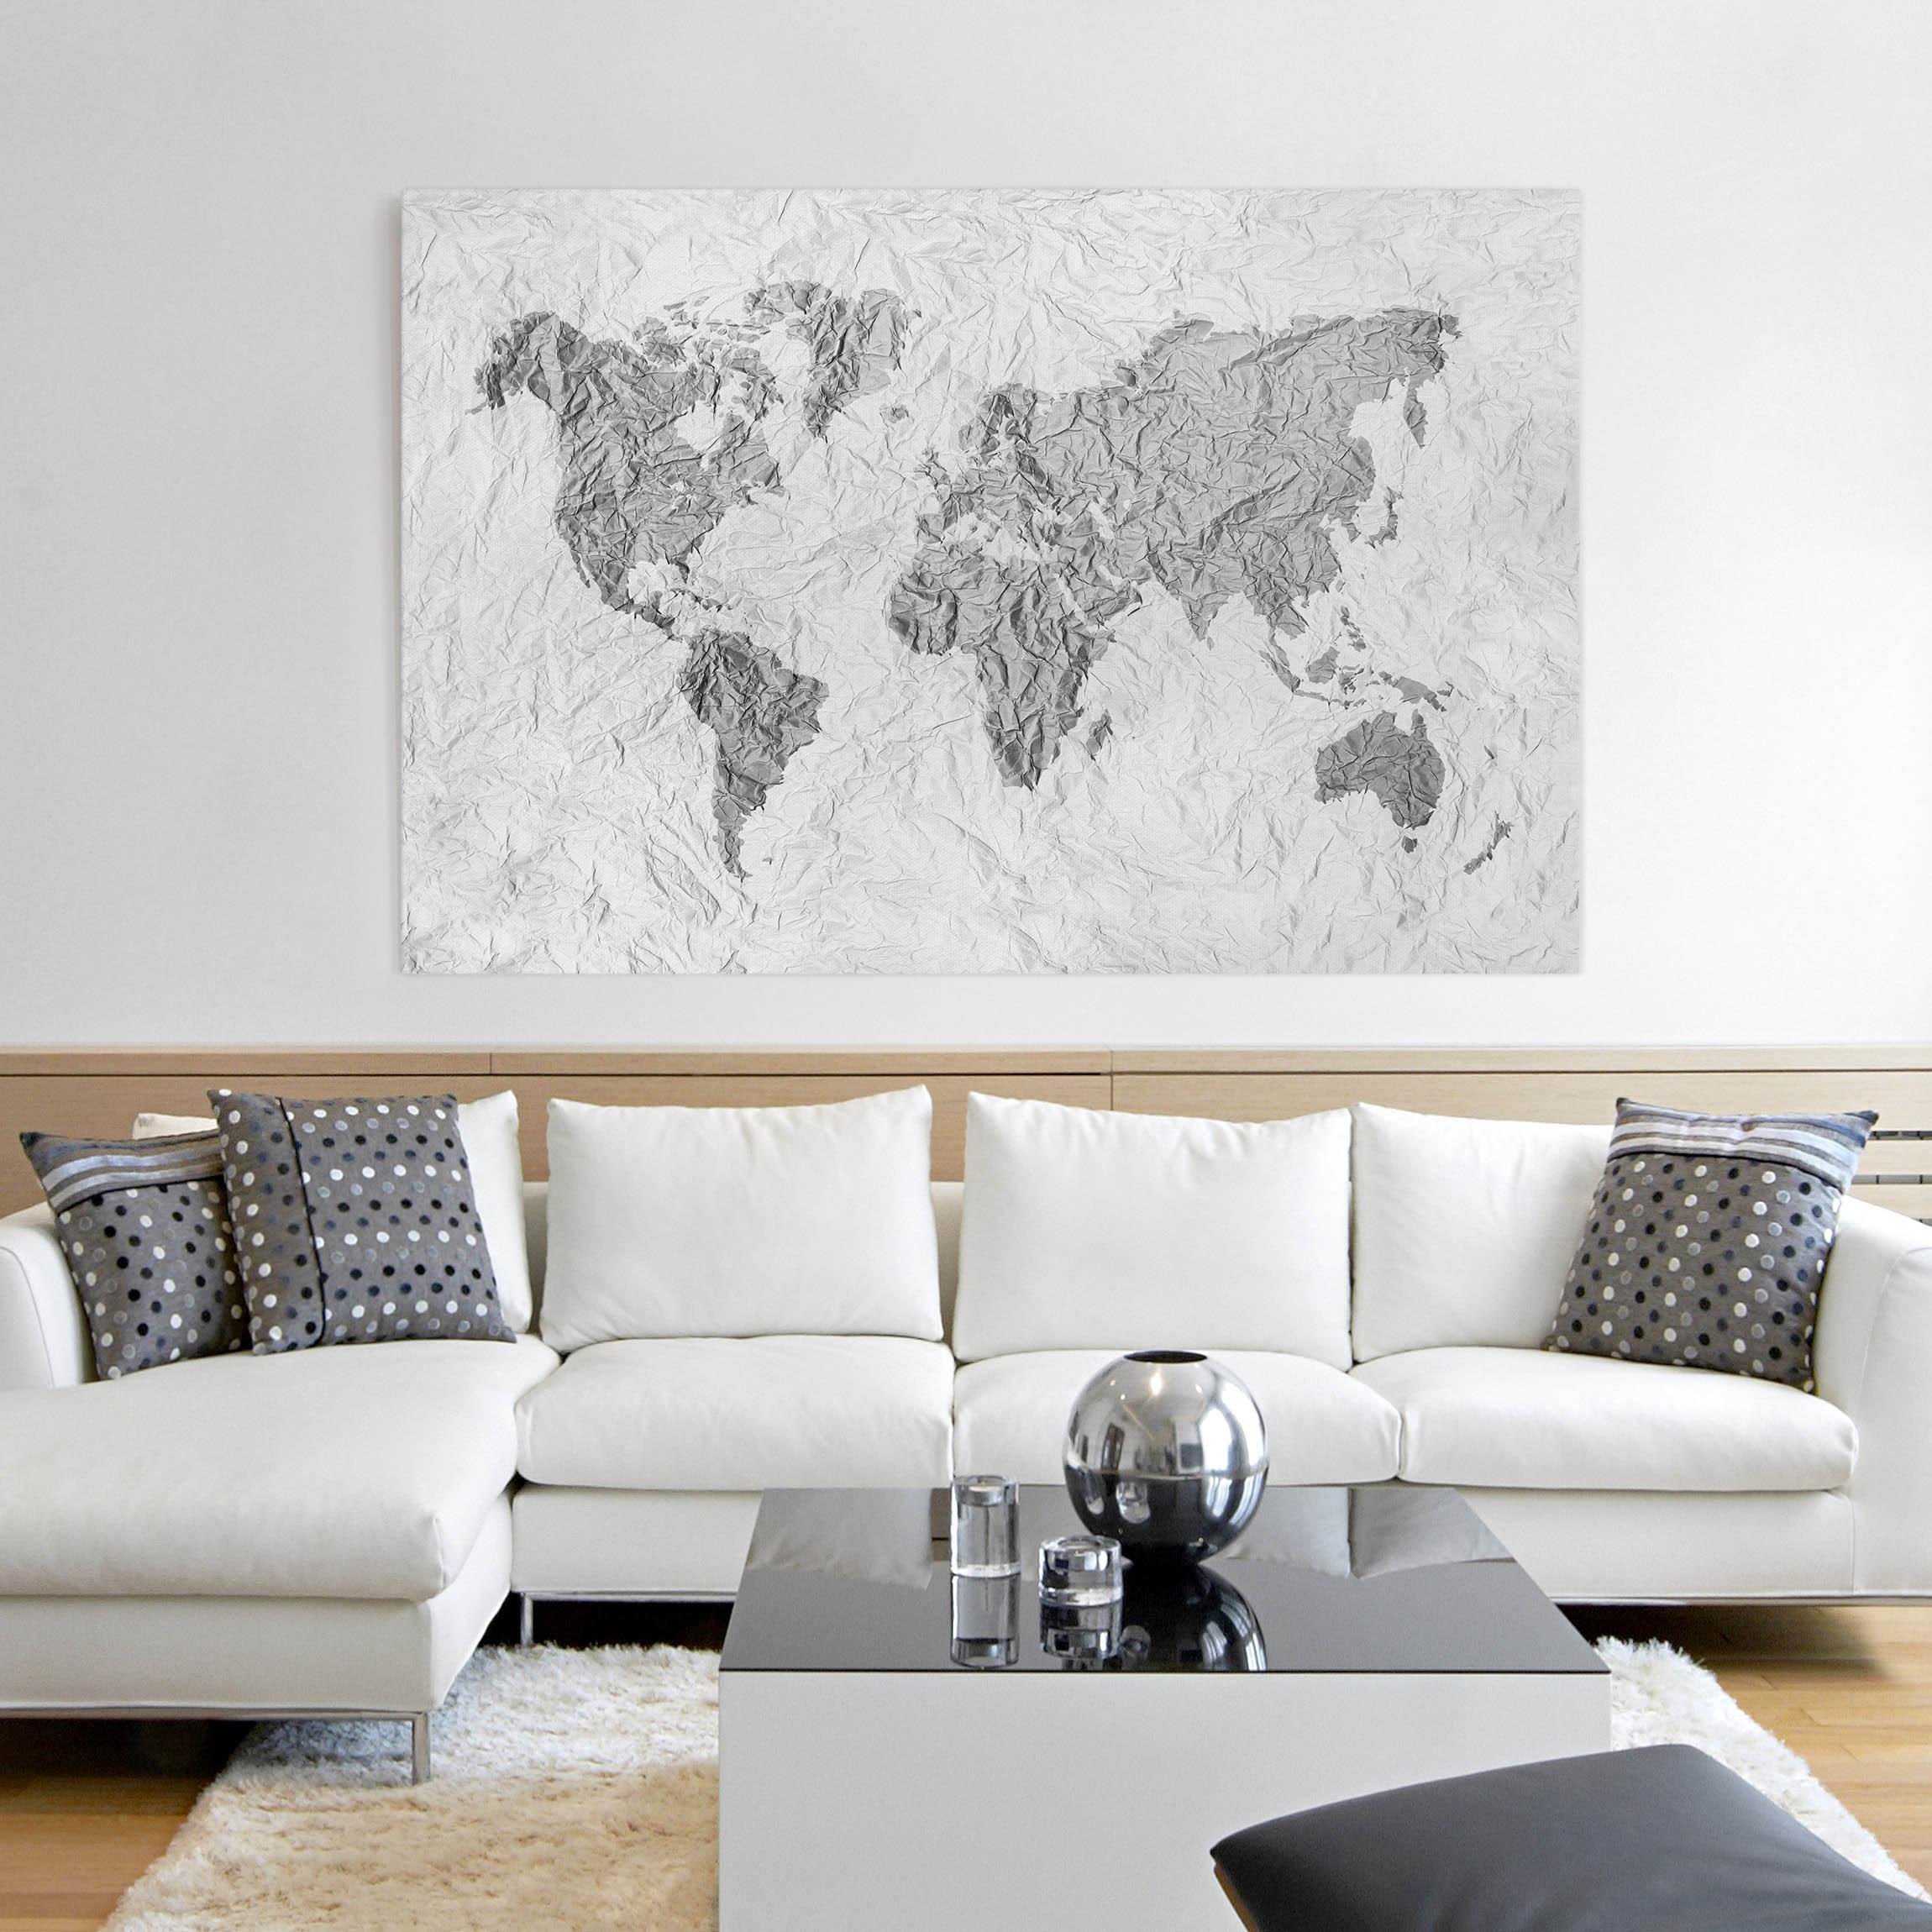 leinwandbild schwarz wei papier weltkarte wei grau. Black Bedroom Furniture Sets. Home Design Ideas